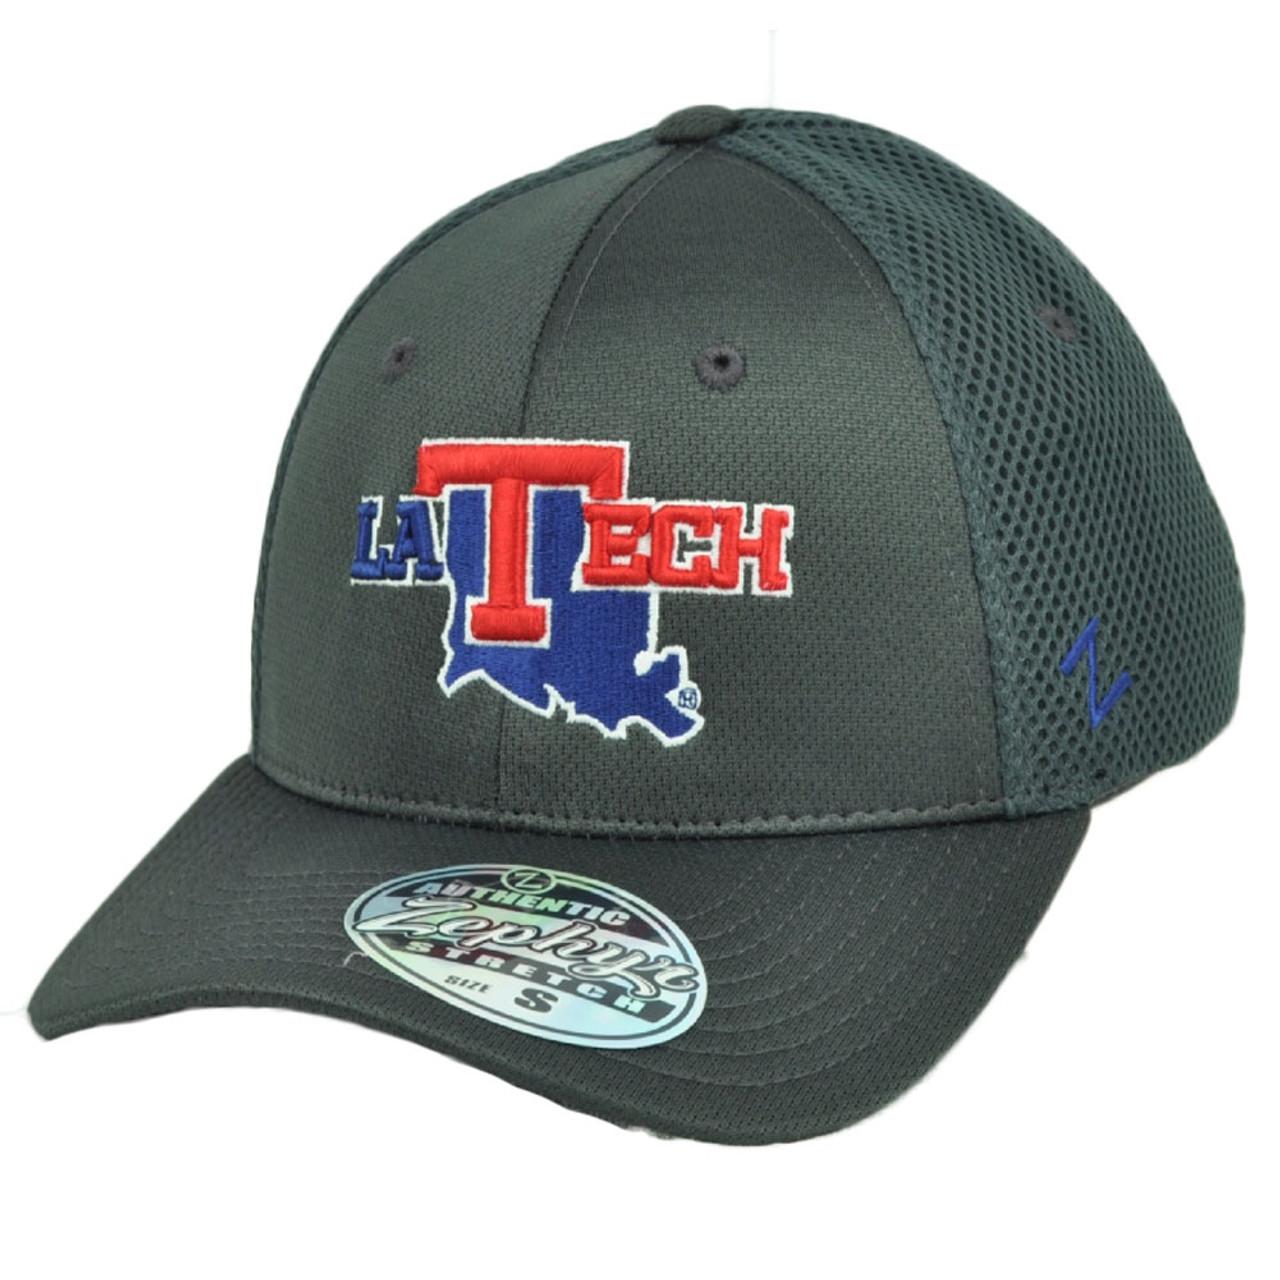 super popular 935ac 6810d NCAA Zephyr Louisiana Tech Bulldogs Flex Fit Medium Large Hat Cap Jersey  Mesh